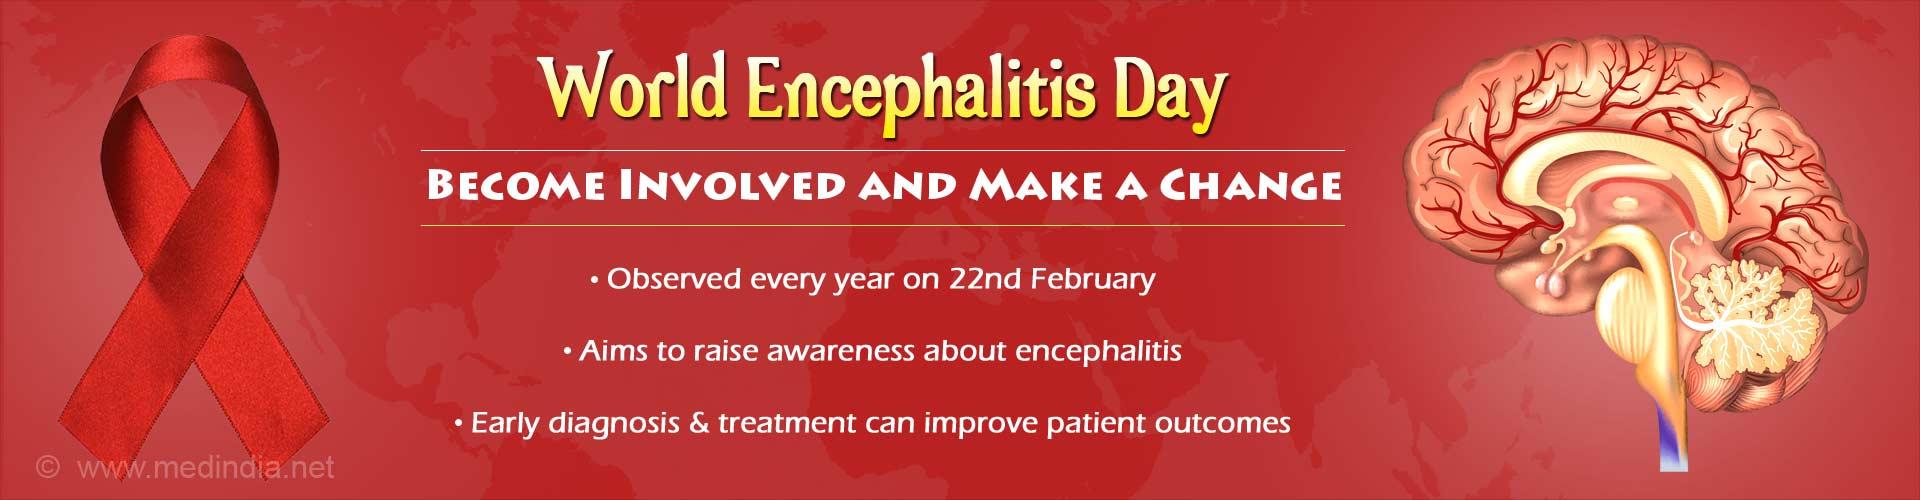 World Encephalitis Day - Providing Support, Hope and Advice